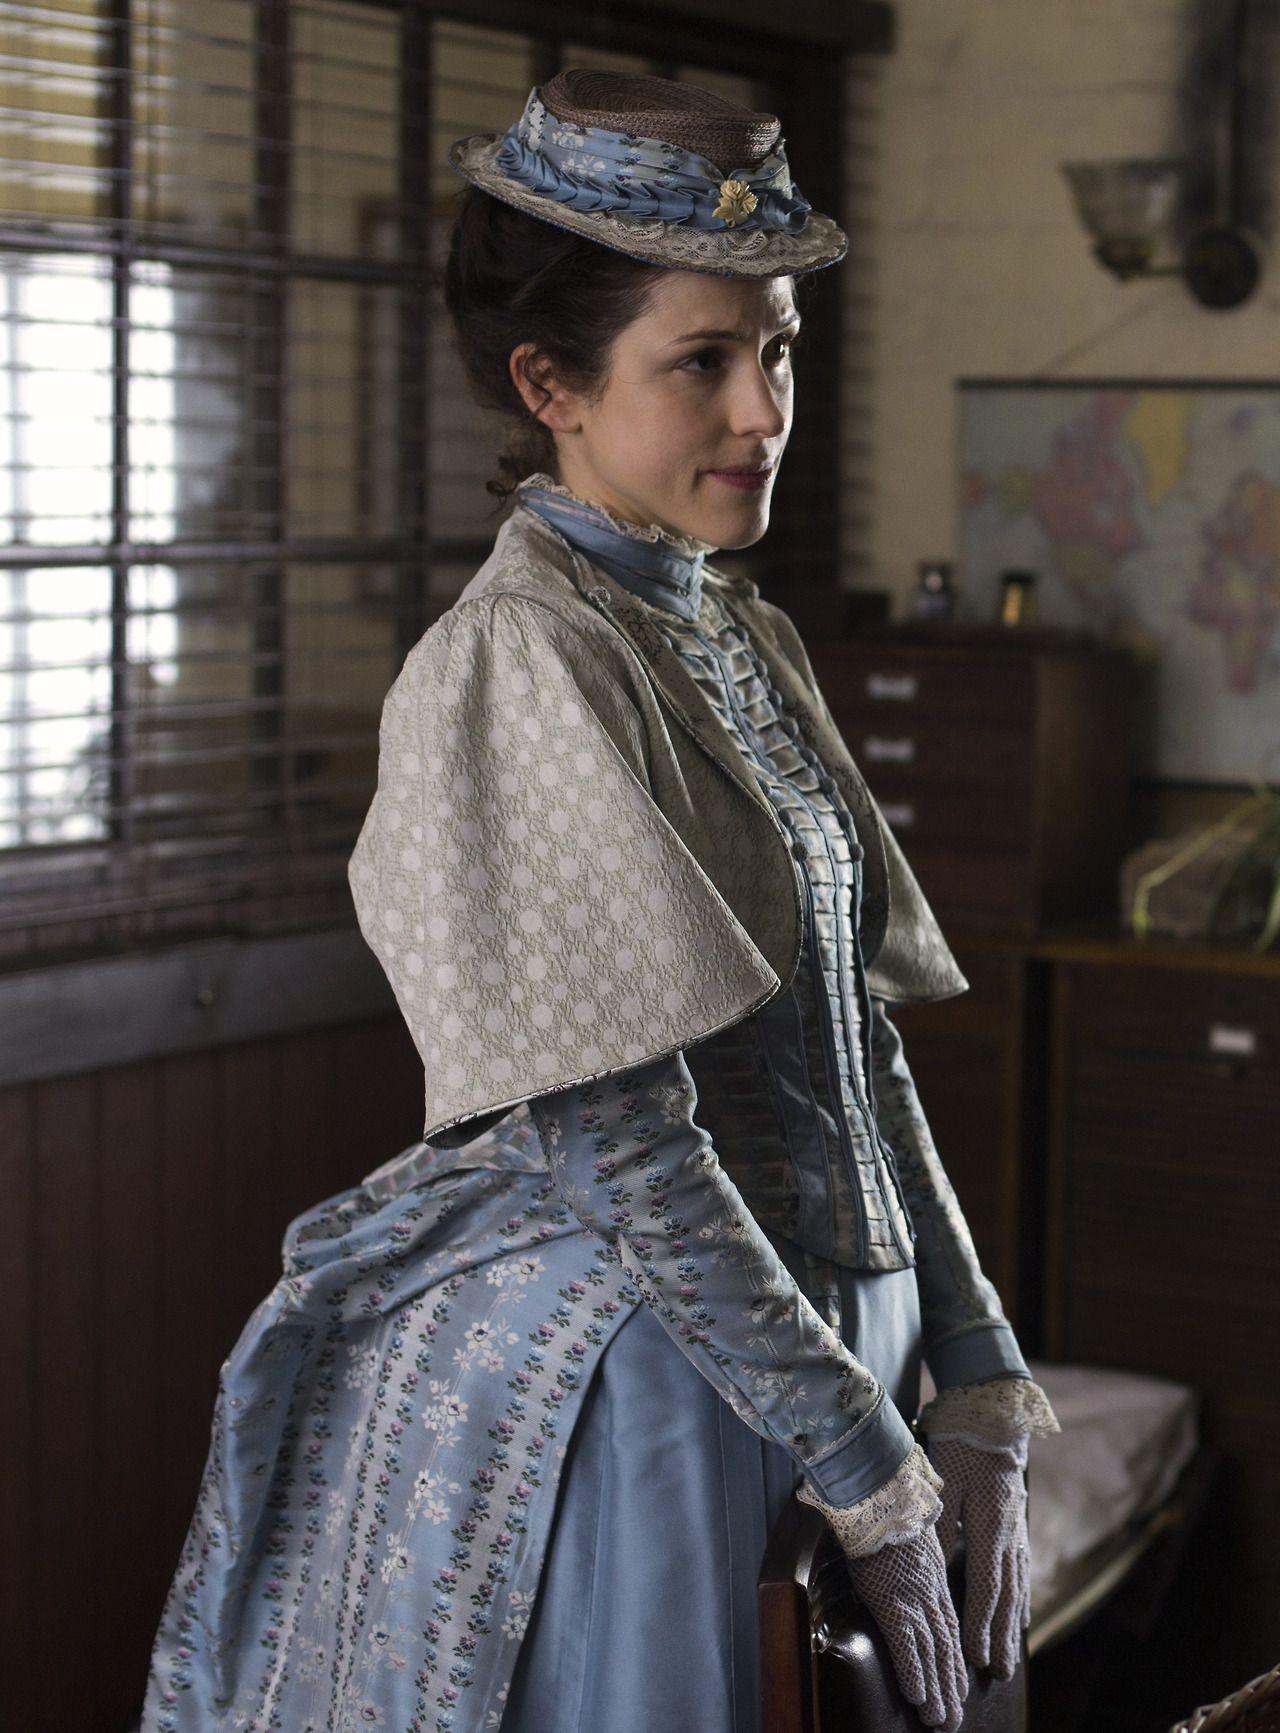 Amanda Hale as Emily Reid in Ripper Street (TV Series, 2012).